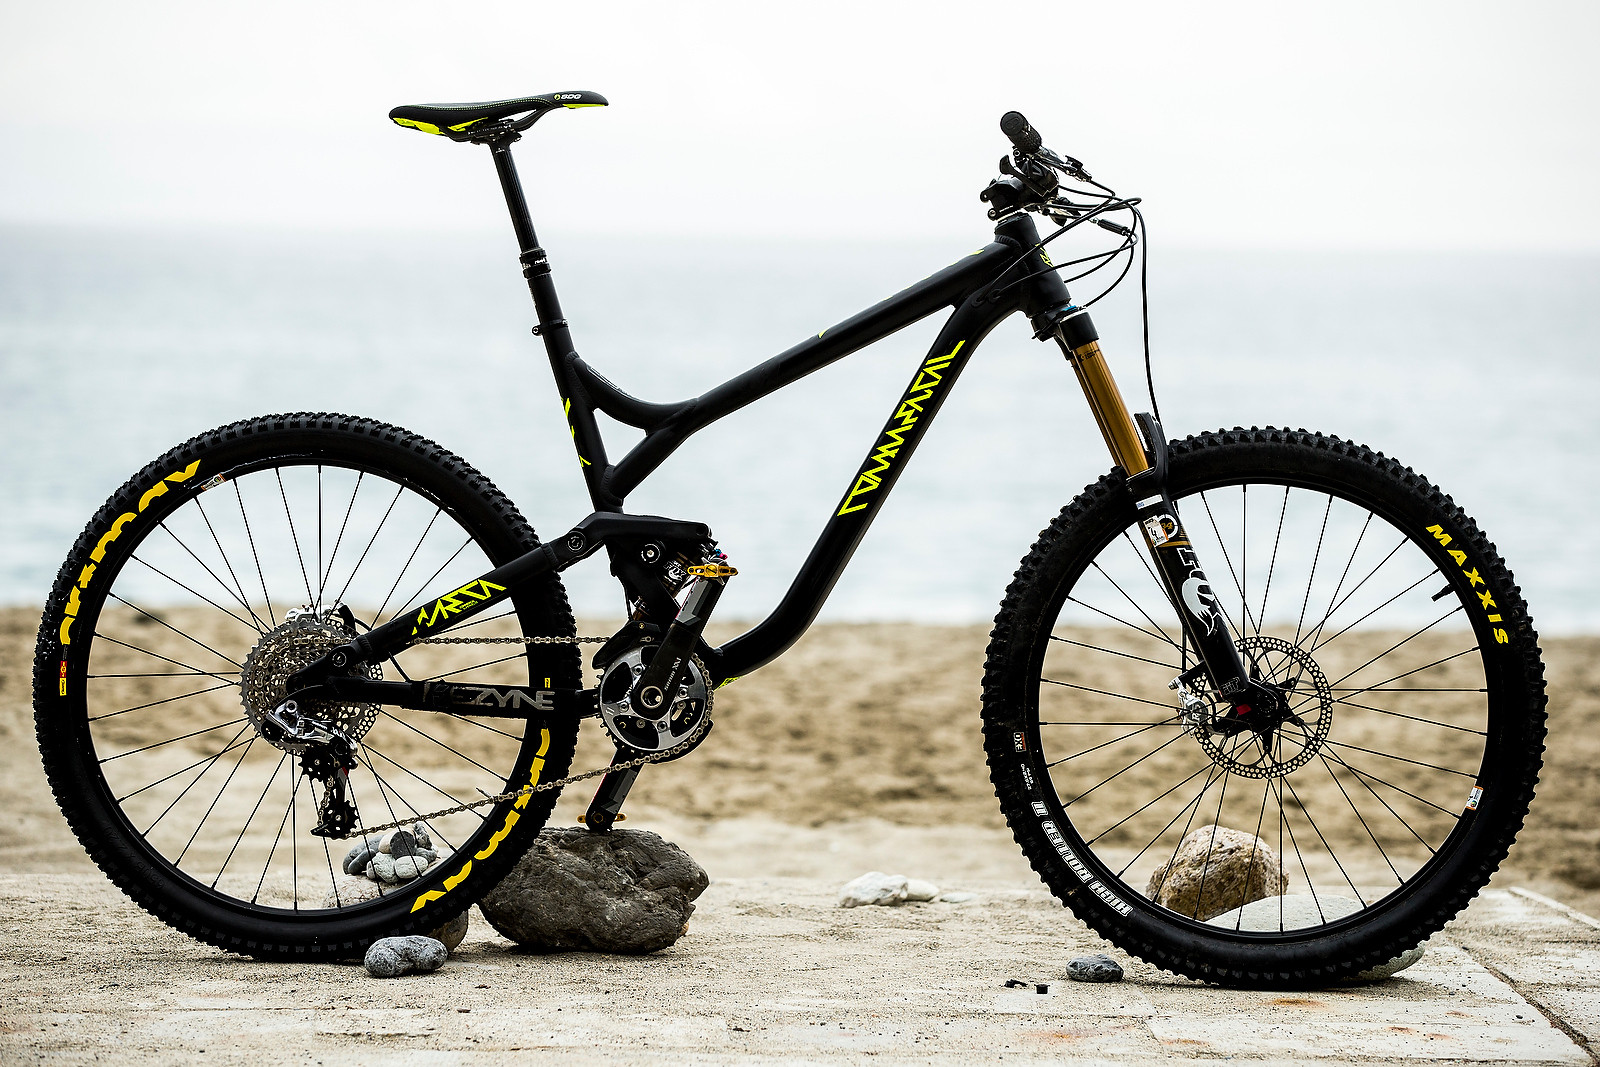 Pro Bike Check: Remy Absalon's Commencal Meta AM 650b - iceman2058 - Mountain Biking Pictures - Vital MTB